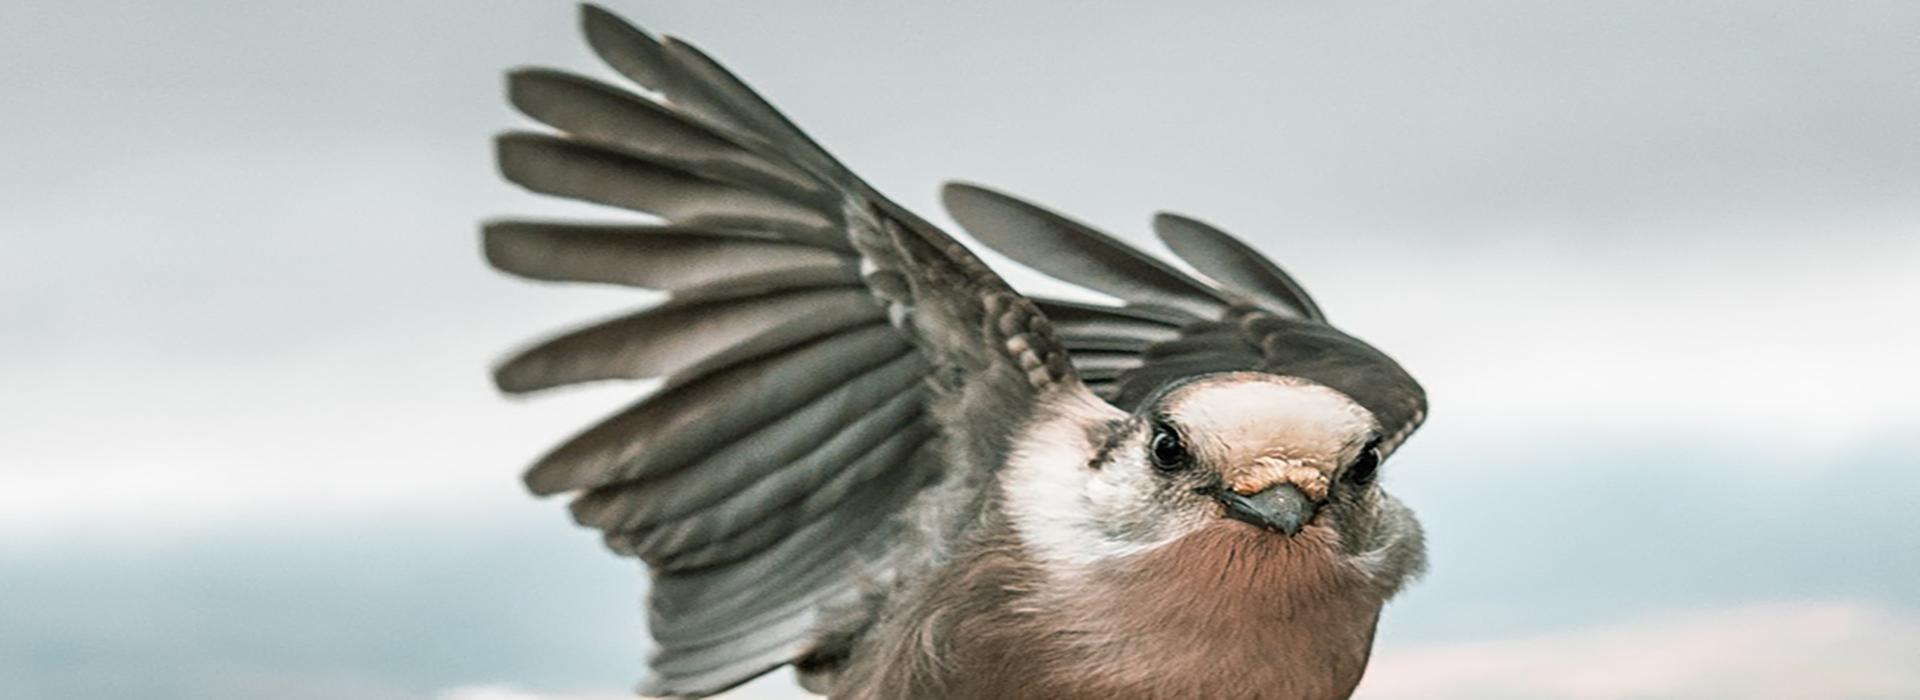 close up of a bird in flight